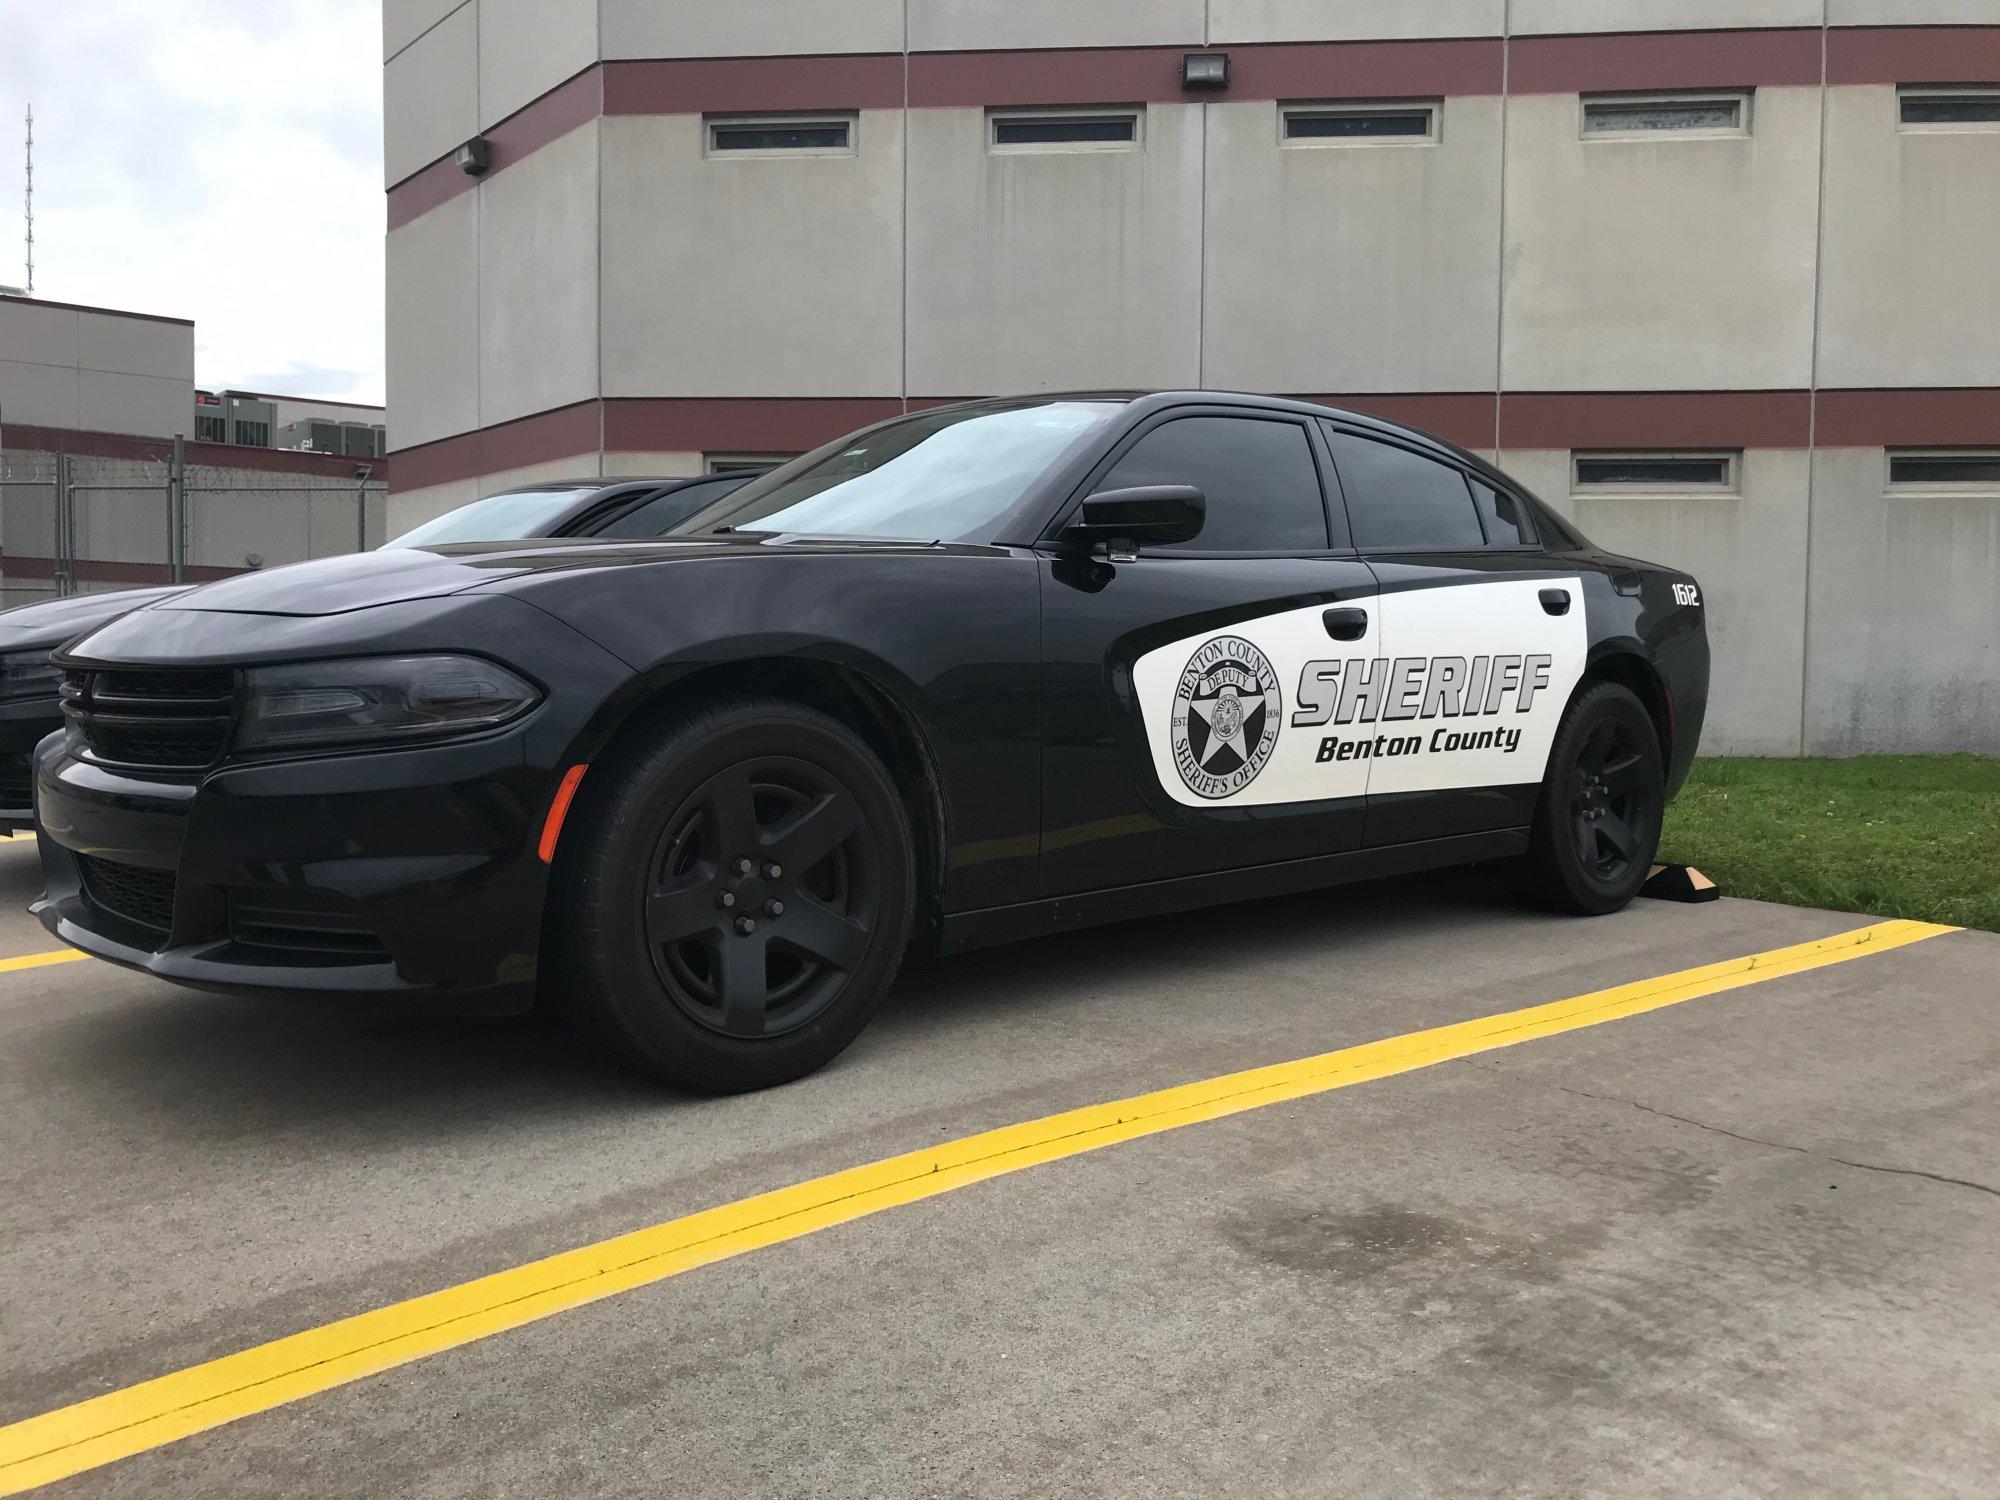 Photo courtesy Benton County Sheriff's Office.